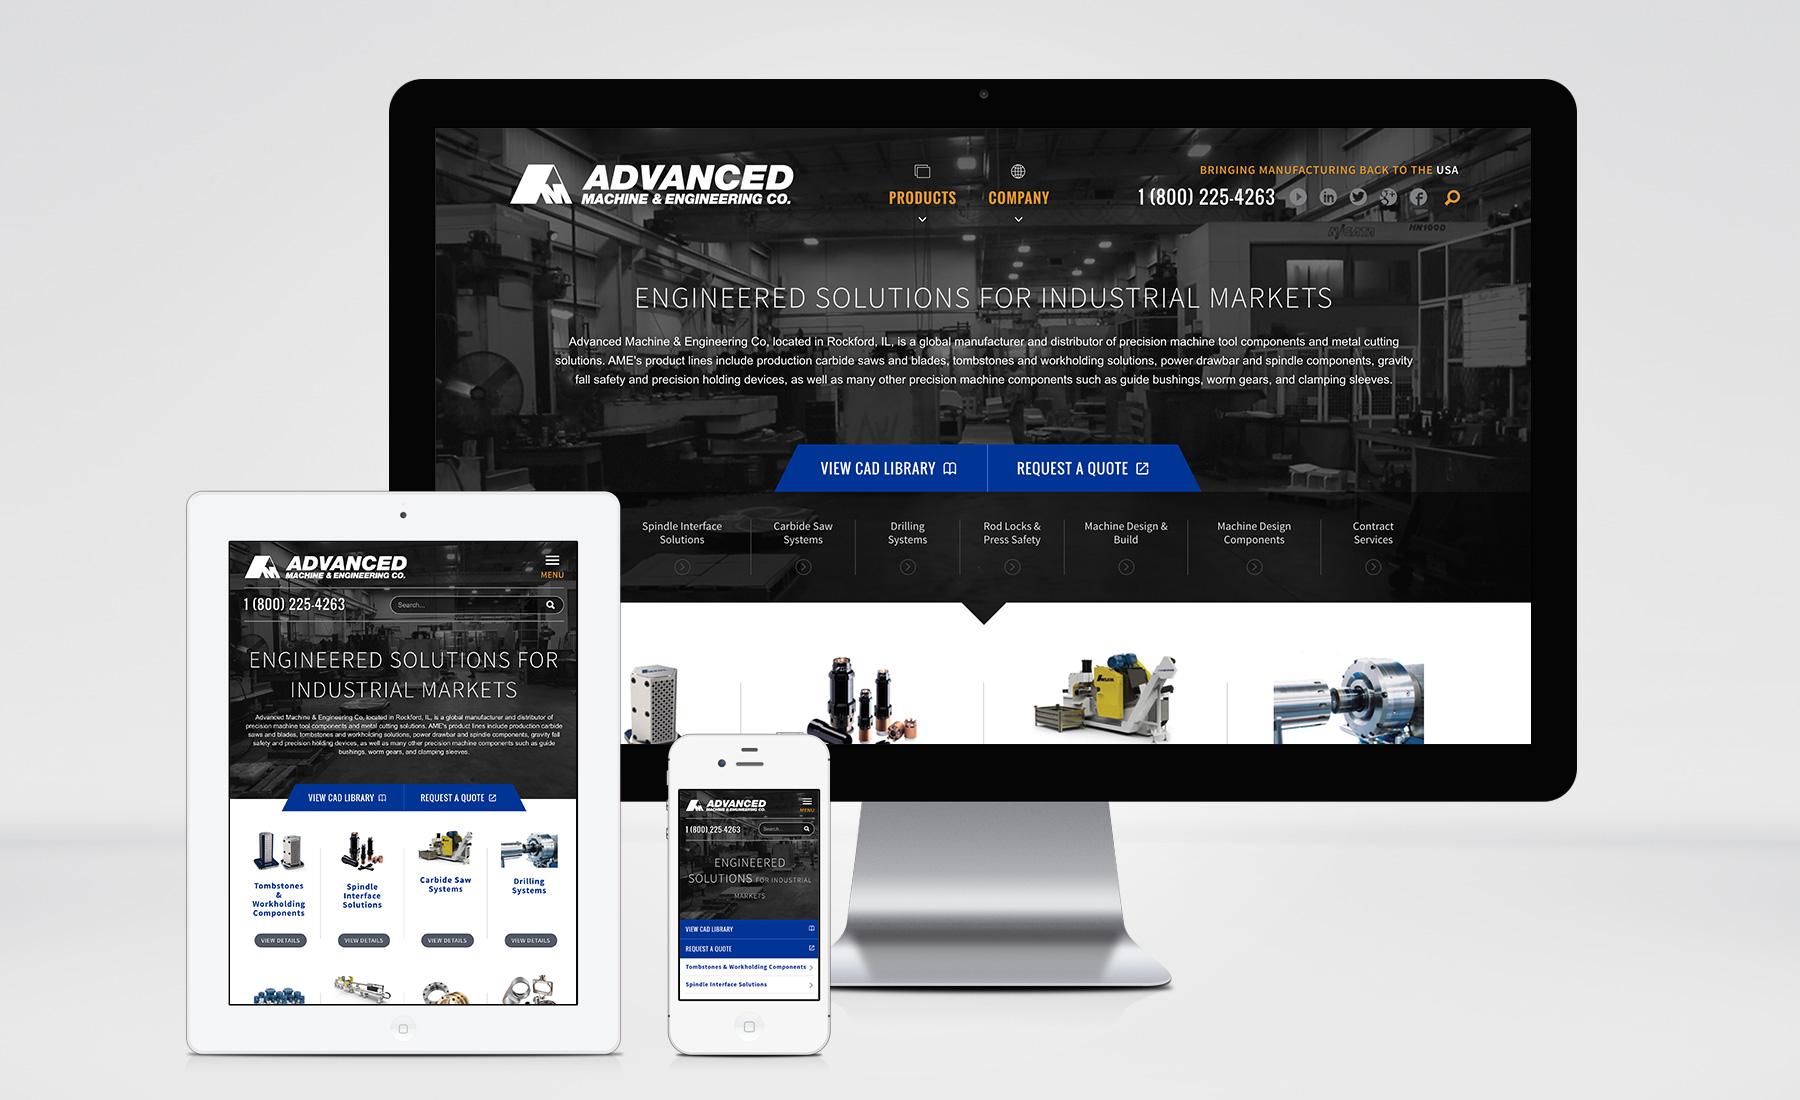 Advanced Machine & Engineering (AME) Website image